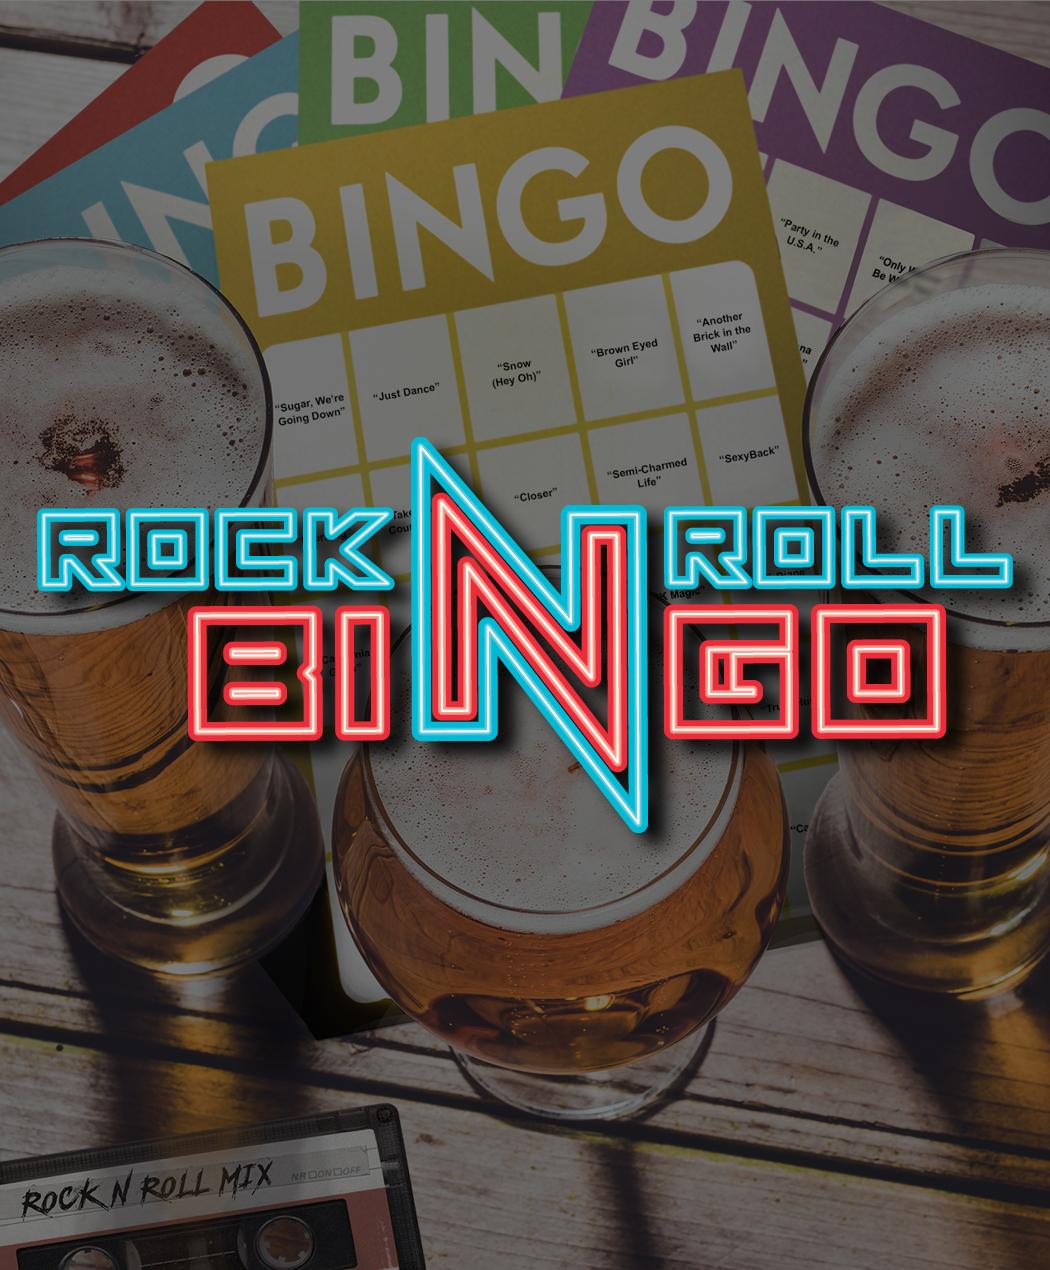 Rock N' Roll Music Trivia Bingo